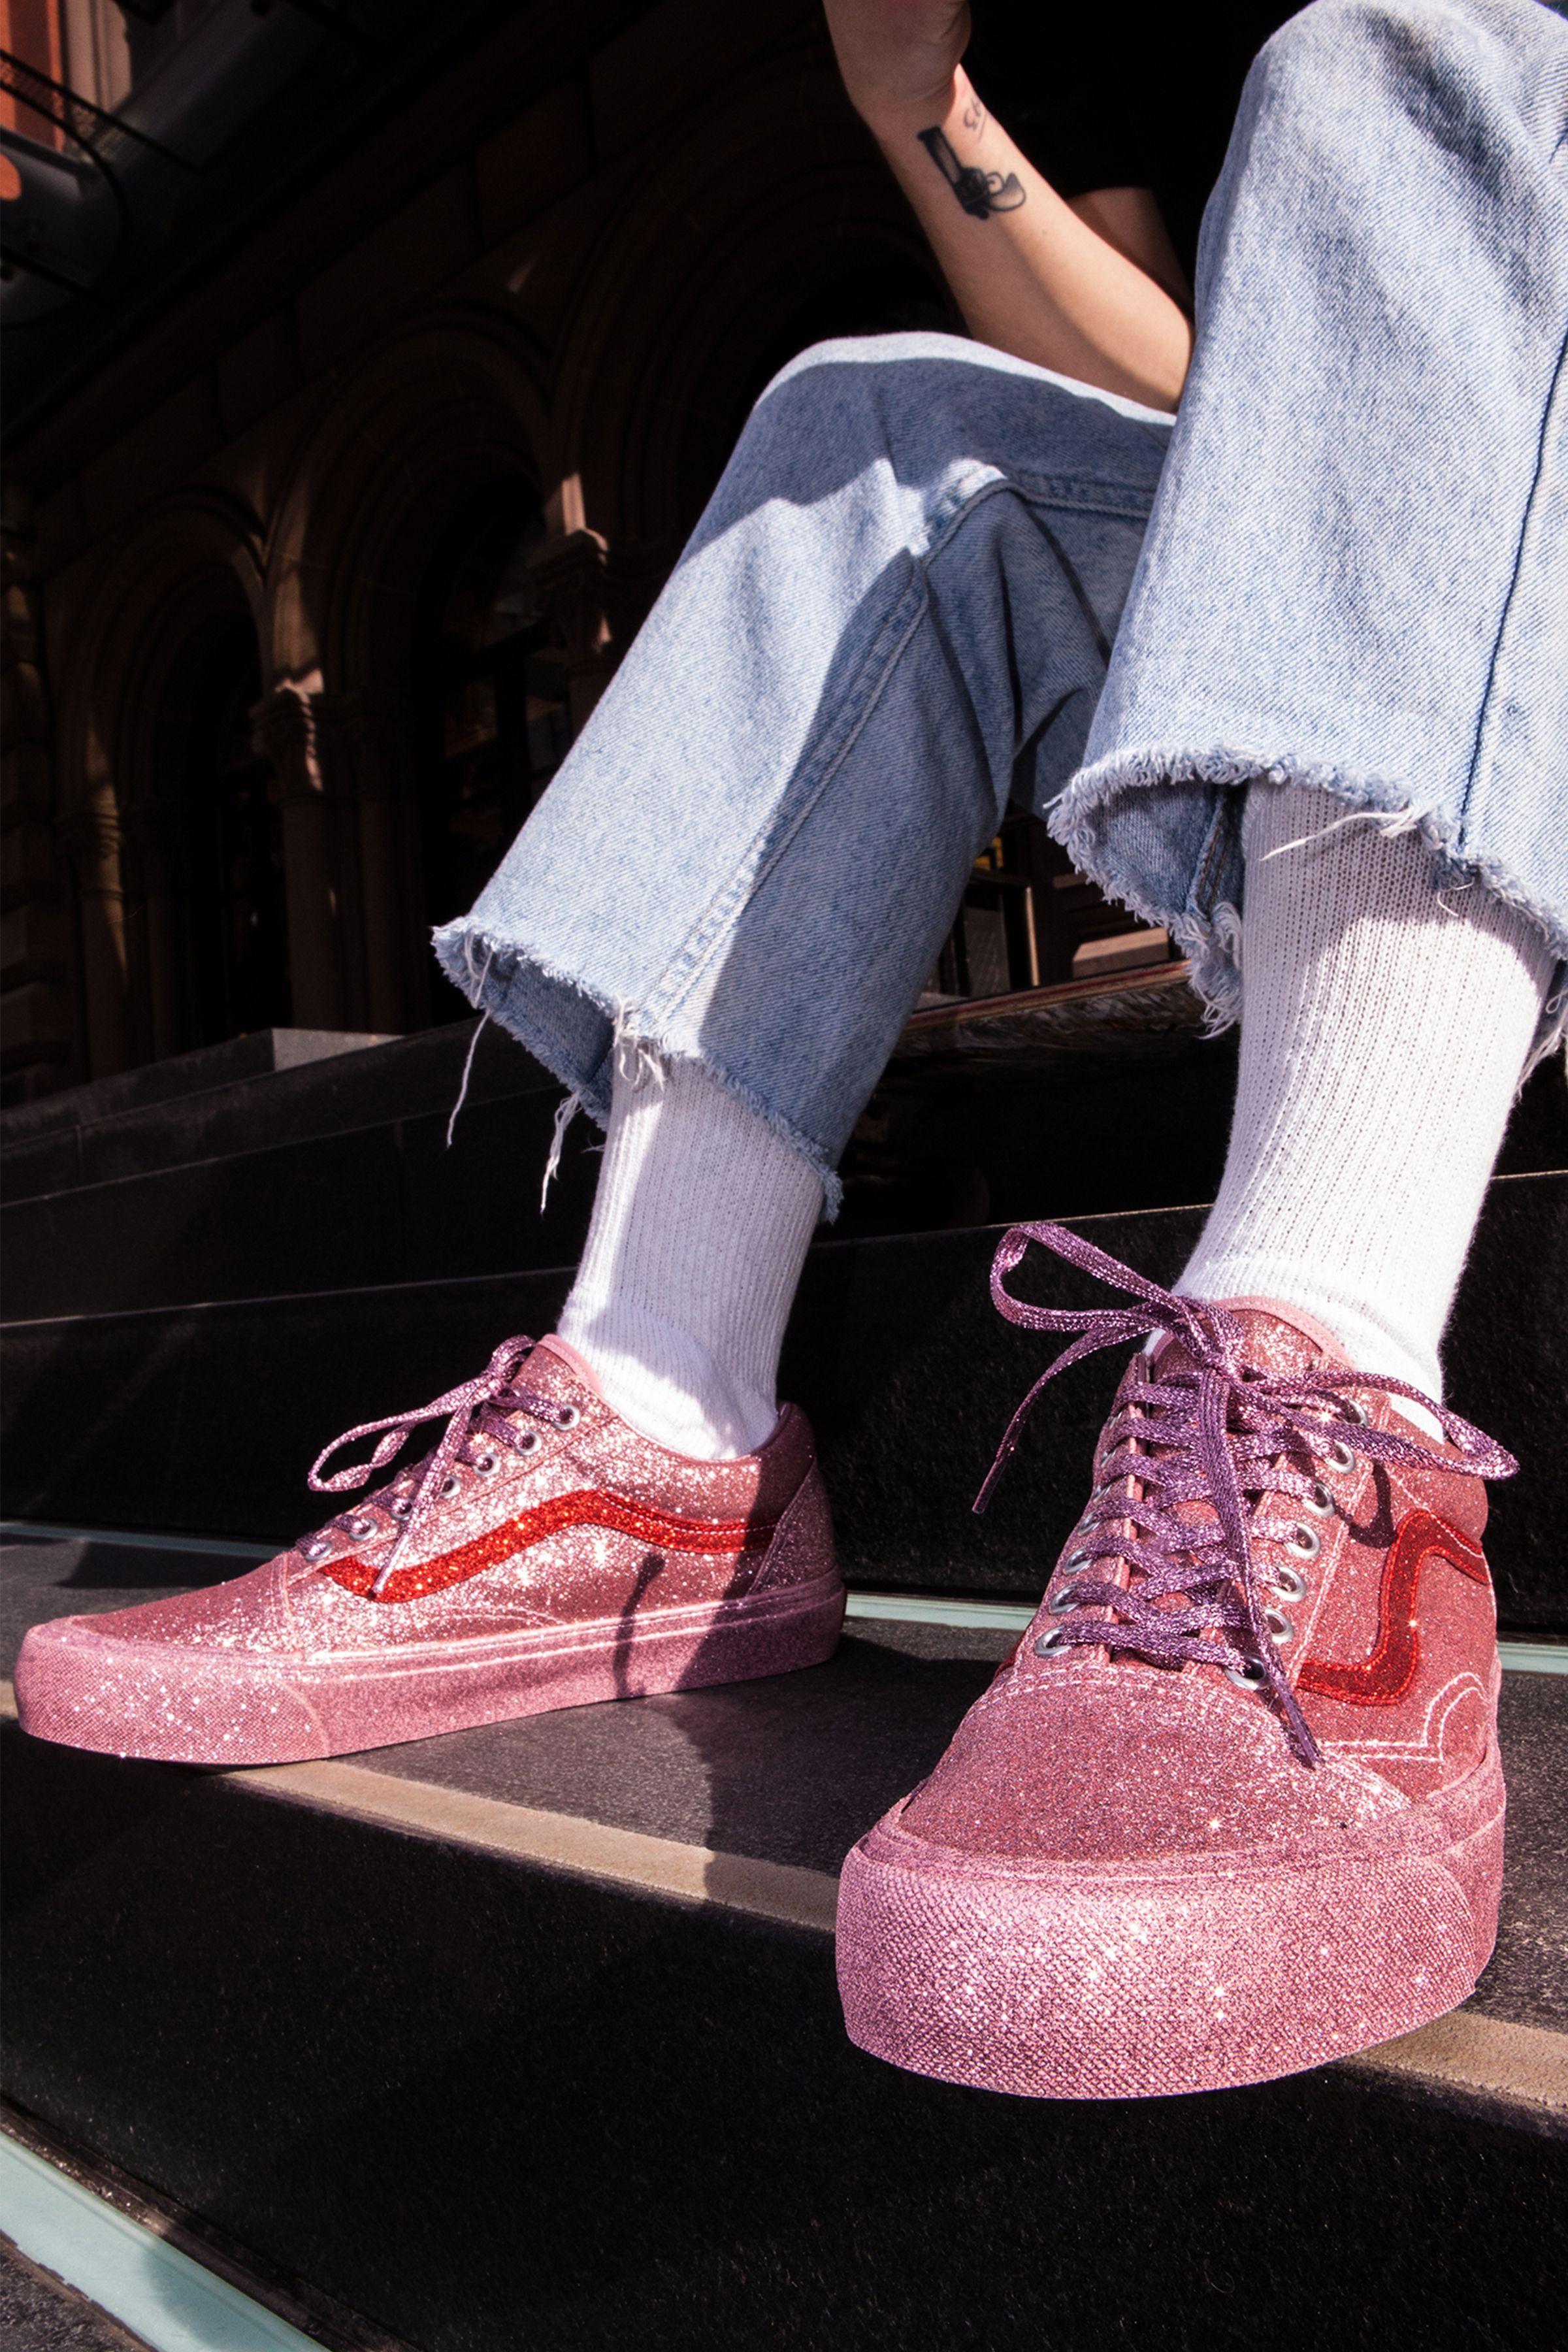 Sparkly vans, Glitter vans, Glittery shoes